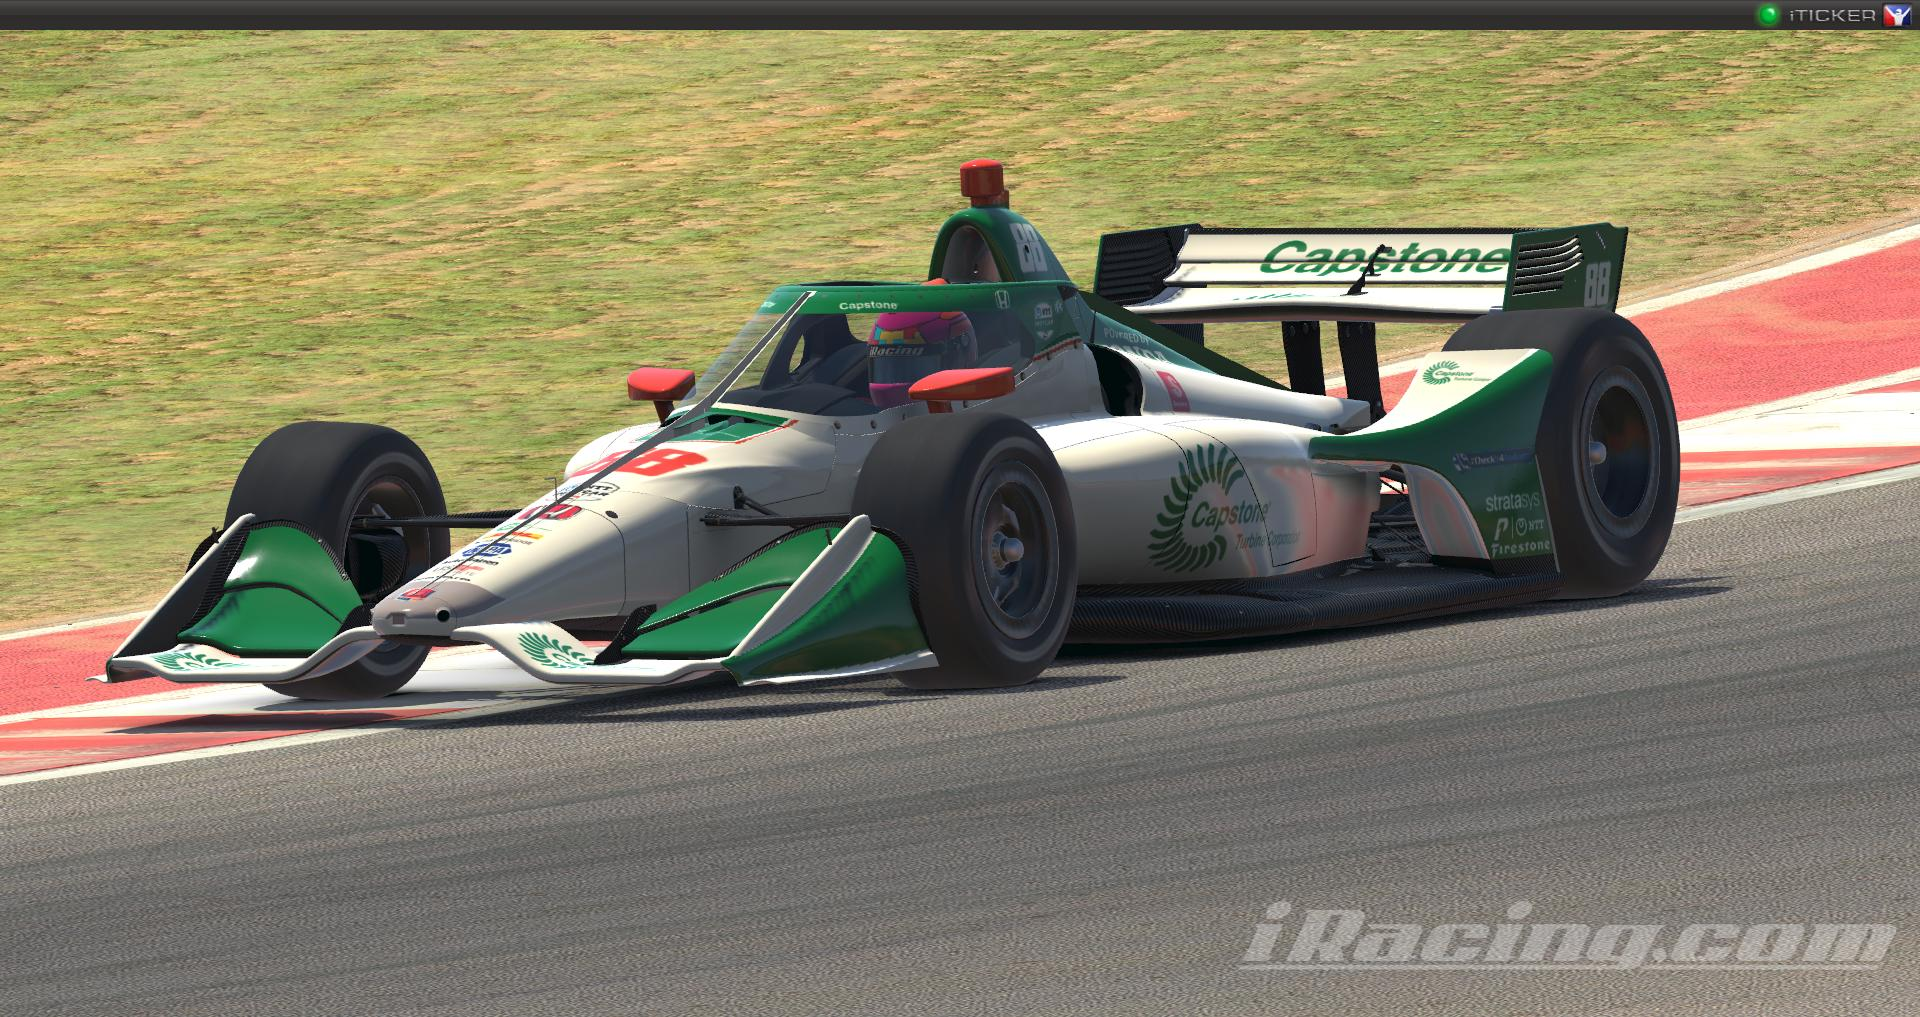 Colton Herta #88 Capstone 2020 NTT Data Indycar Series by ...